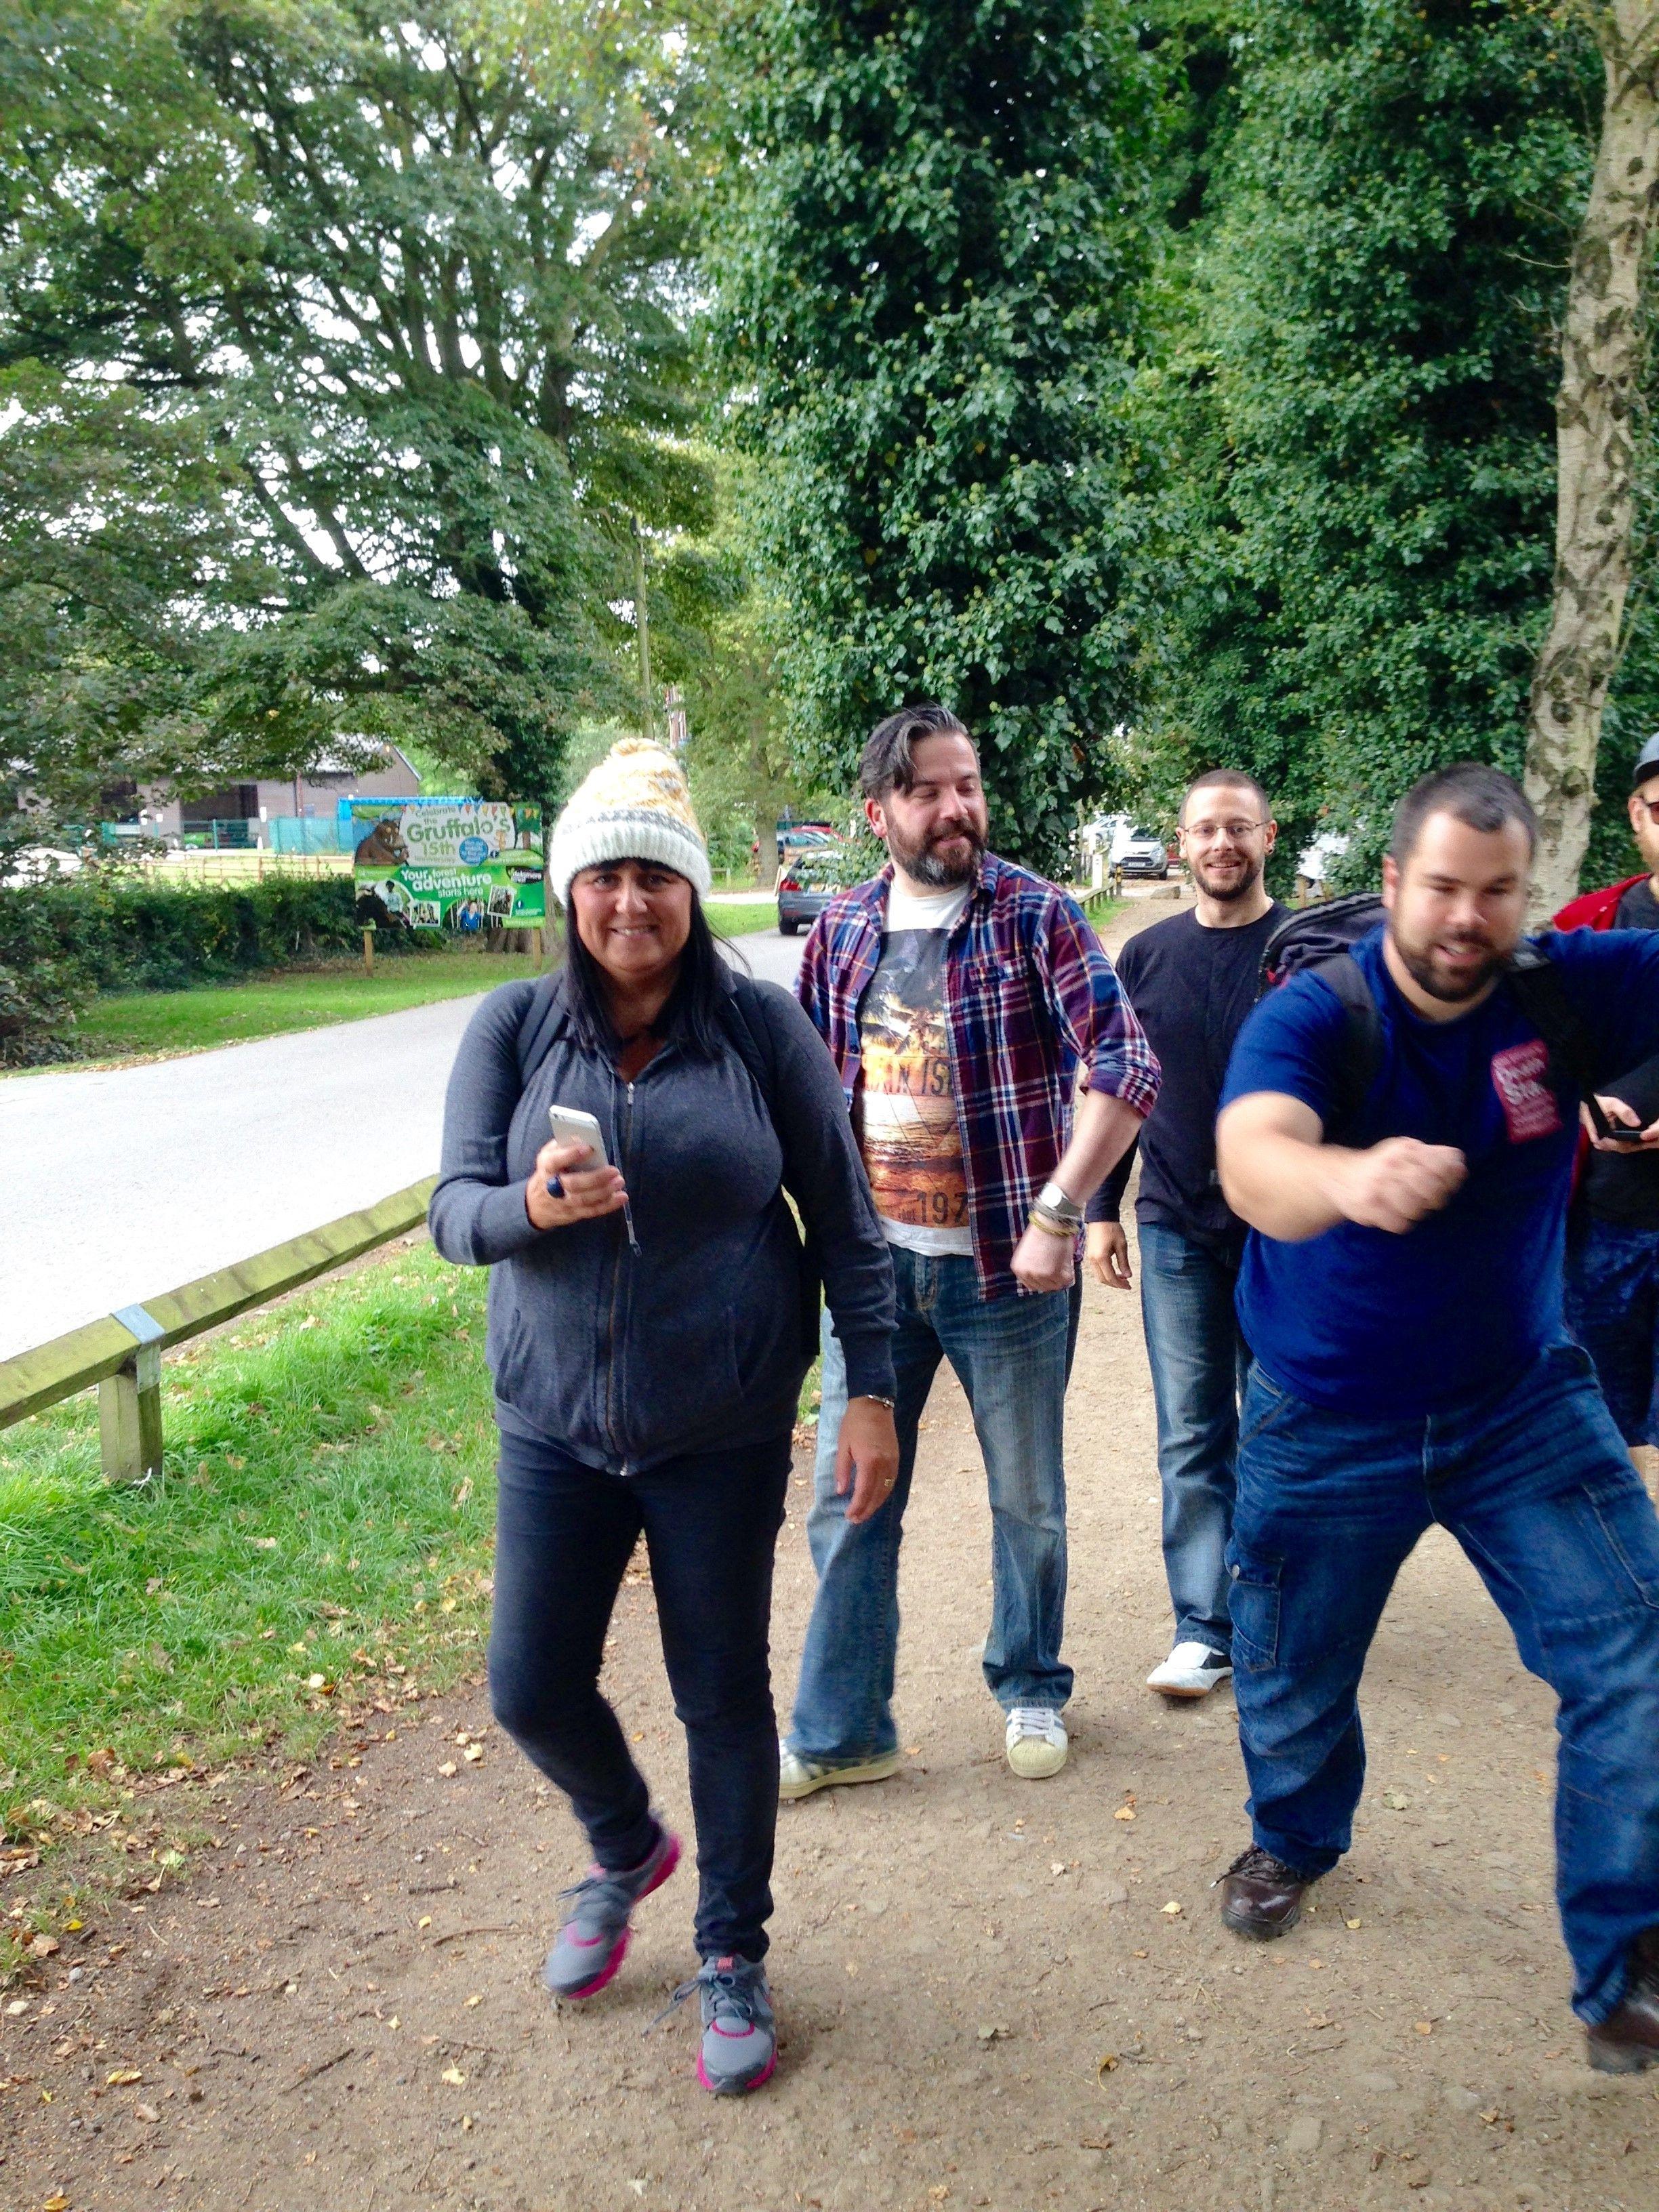 Team trek through the woods